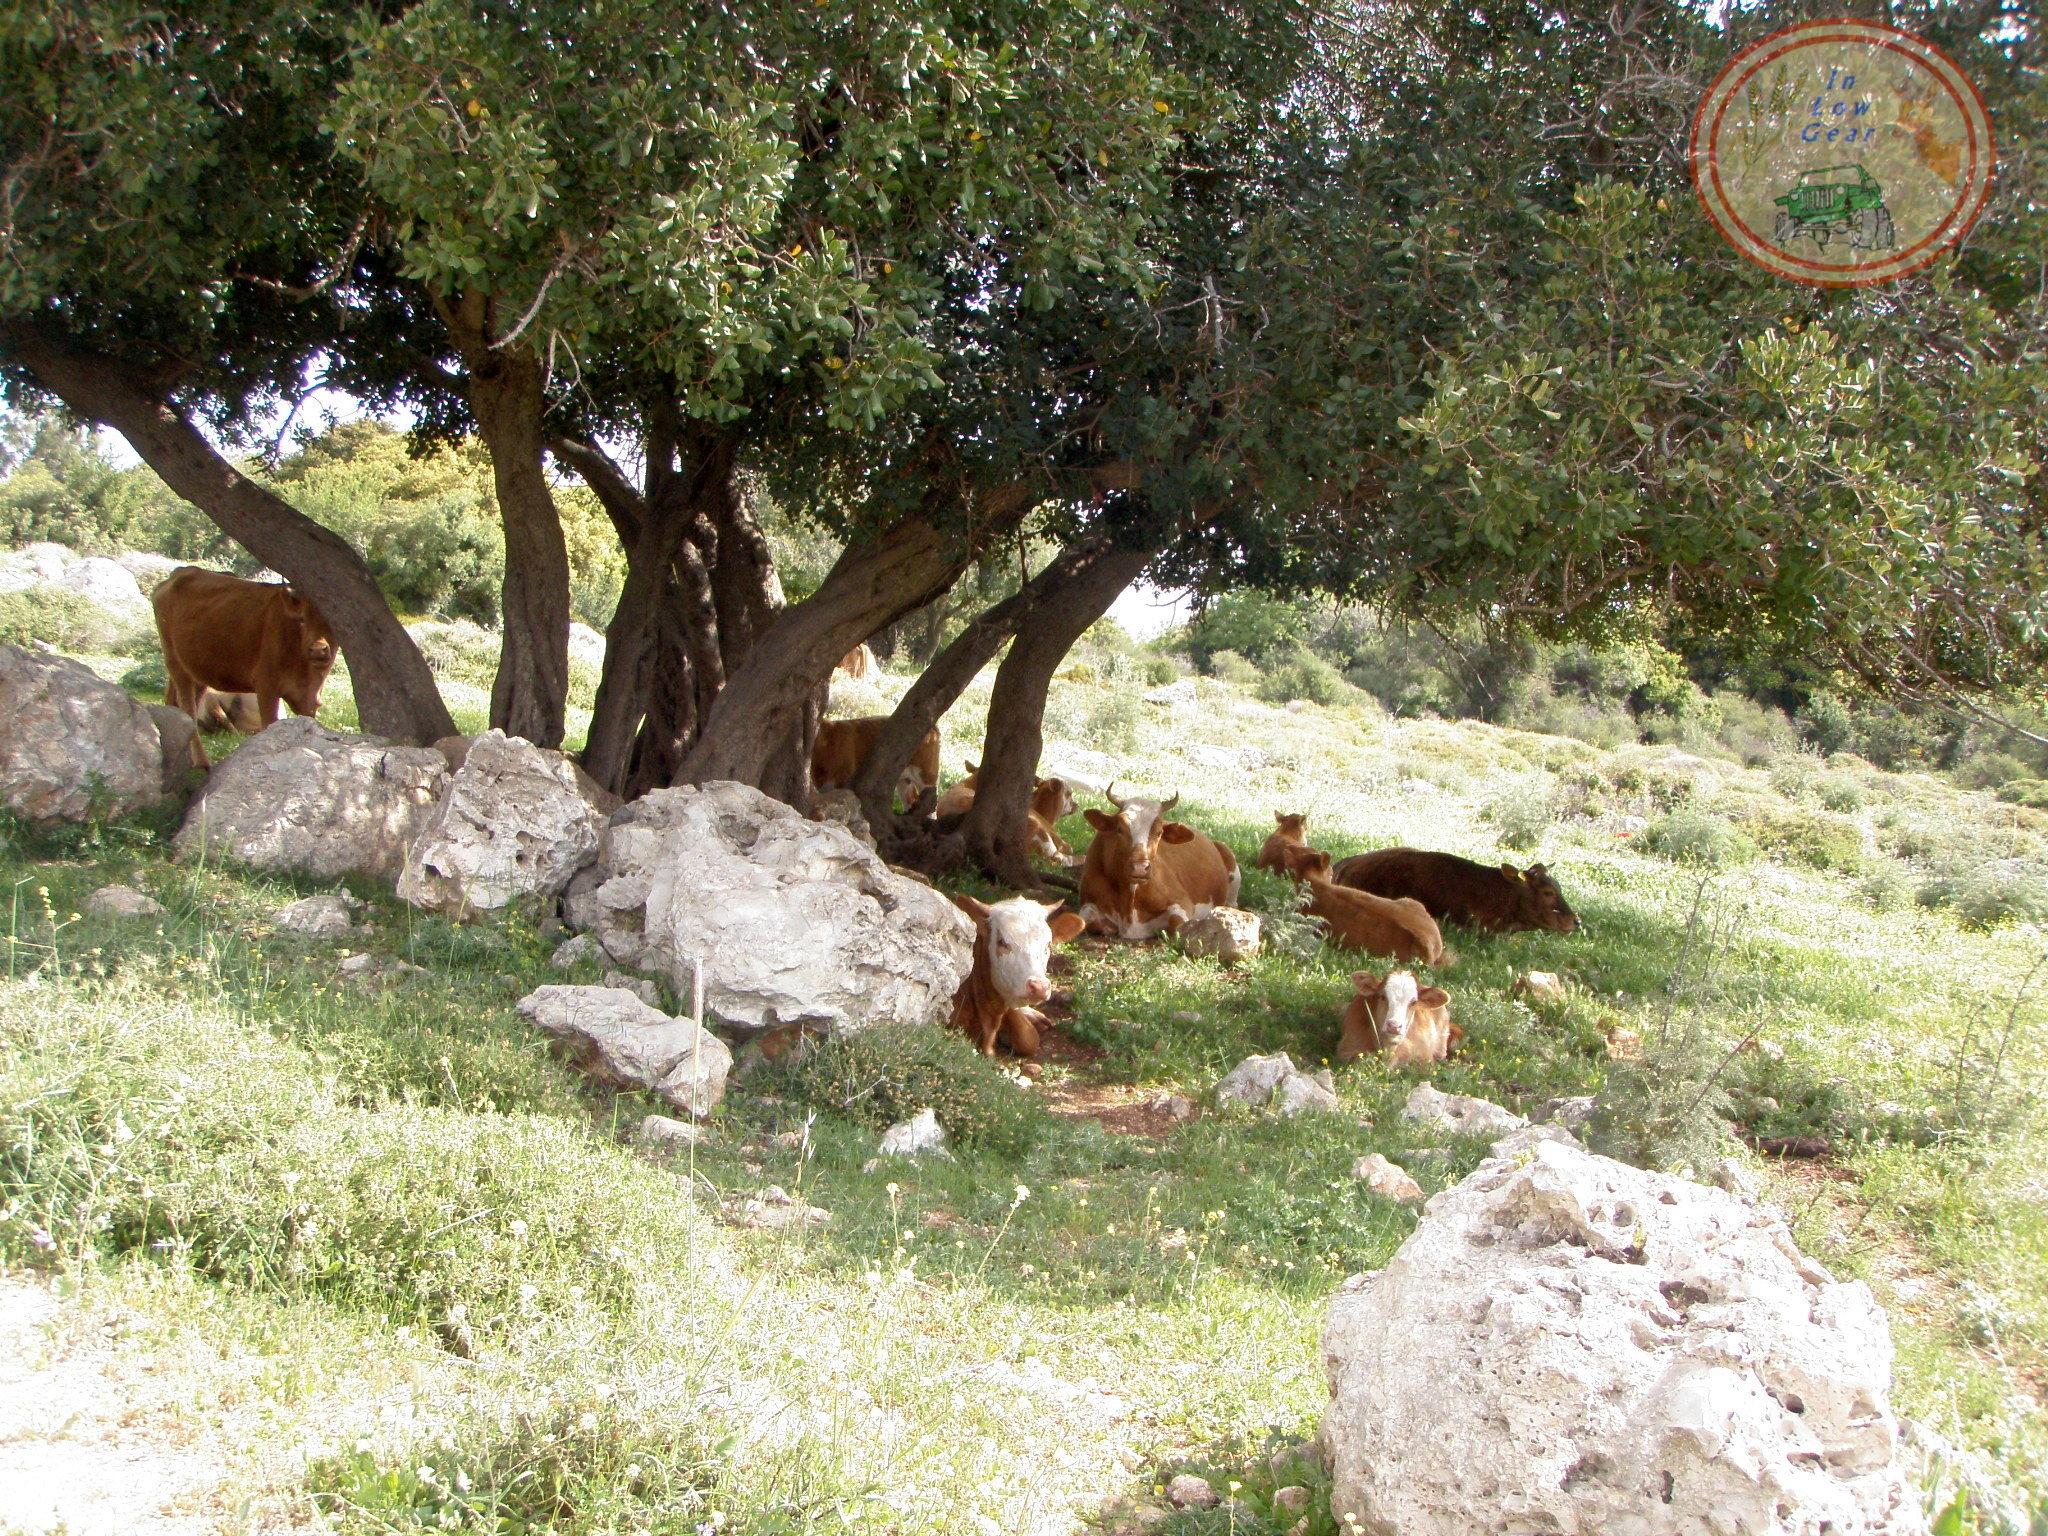 N. Carmel open grazing. מרעה טבעי על הכרמל